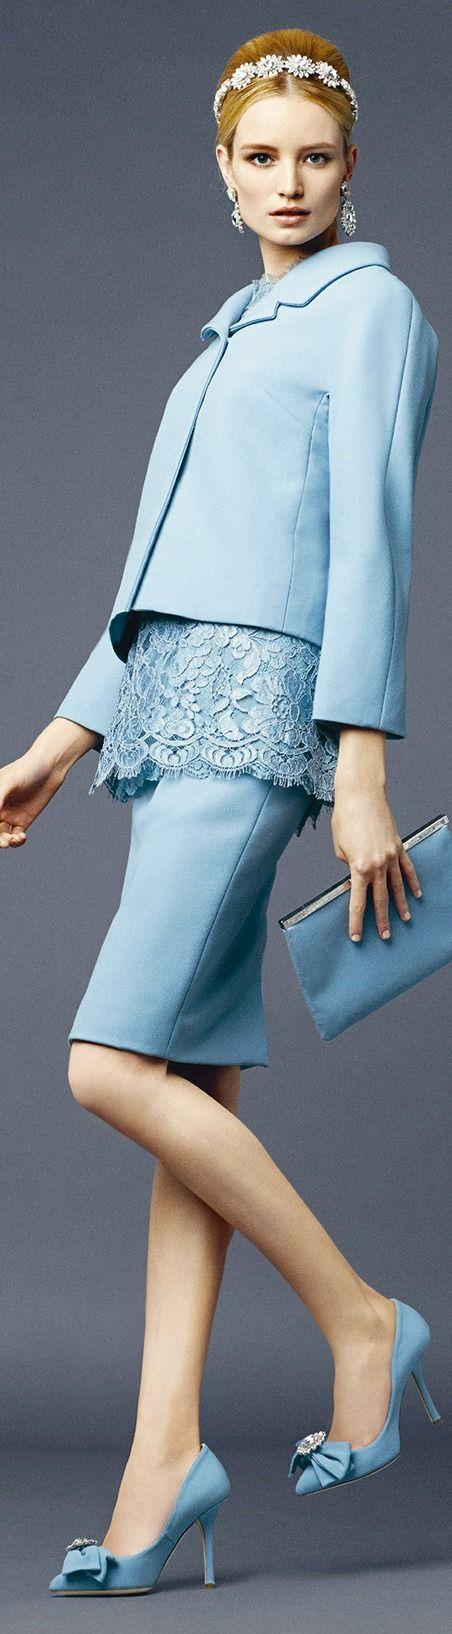 Dolce & Gabbana, Spring/Summer 2014, Blue,: